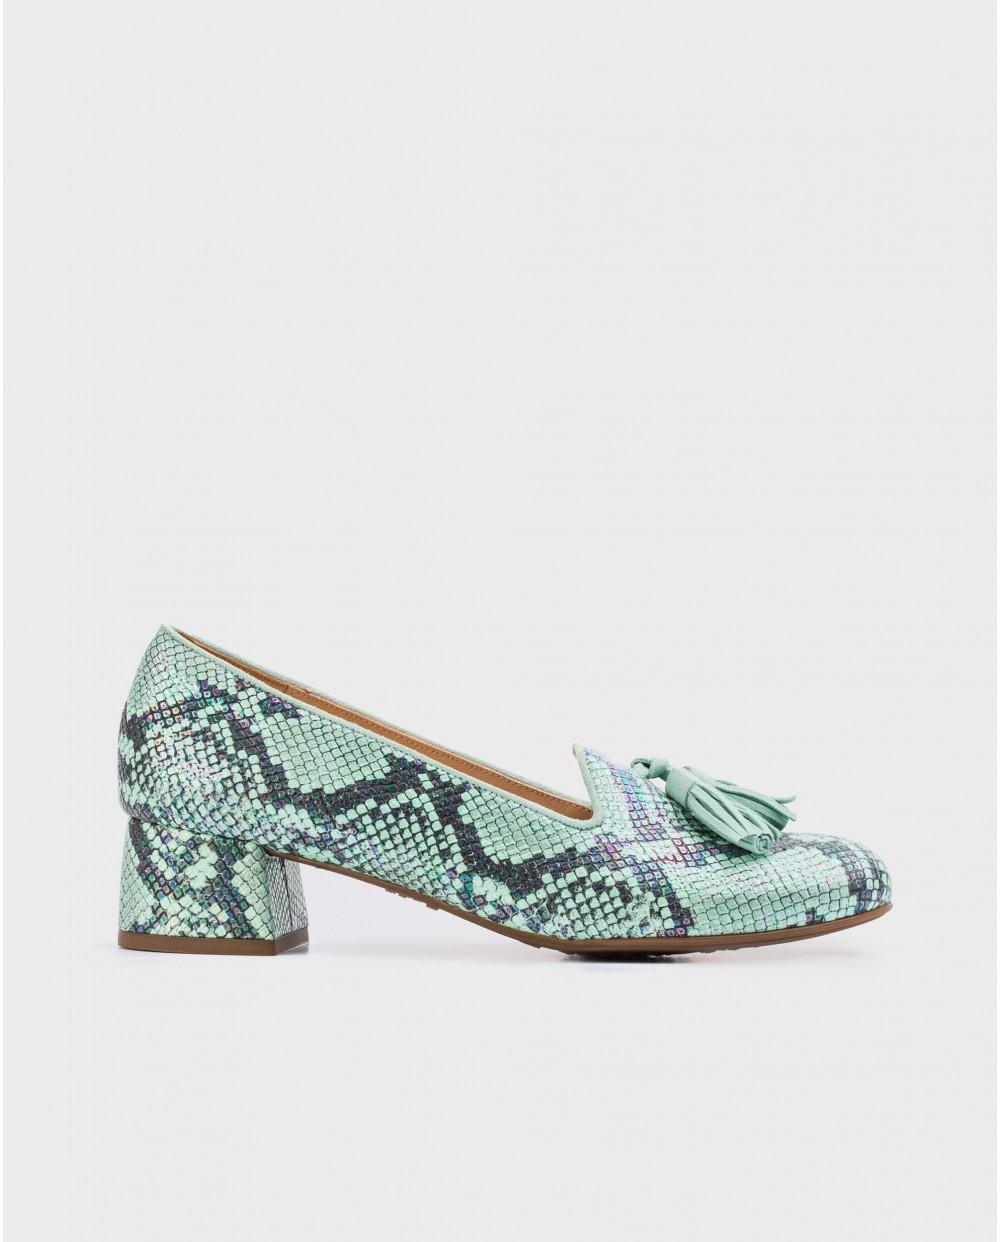 Wonders-Flat Shoes-High heeled ballet pump with tassels